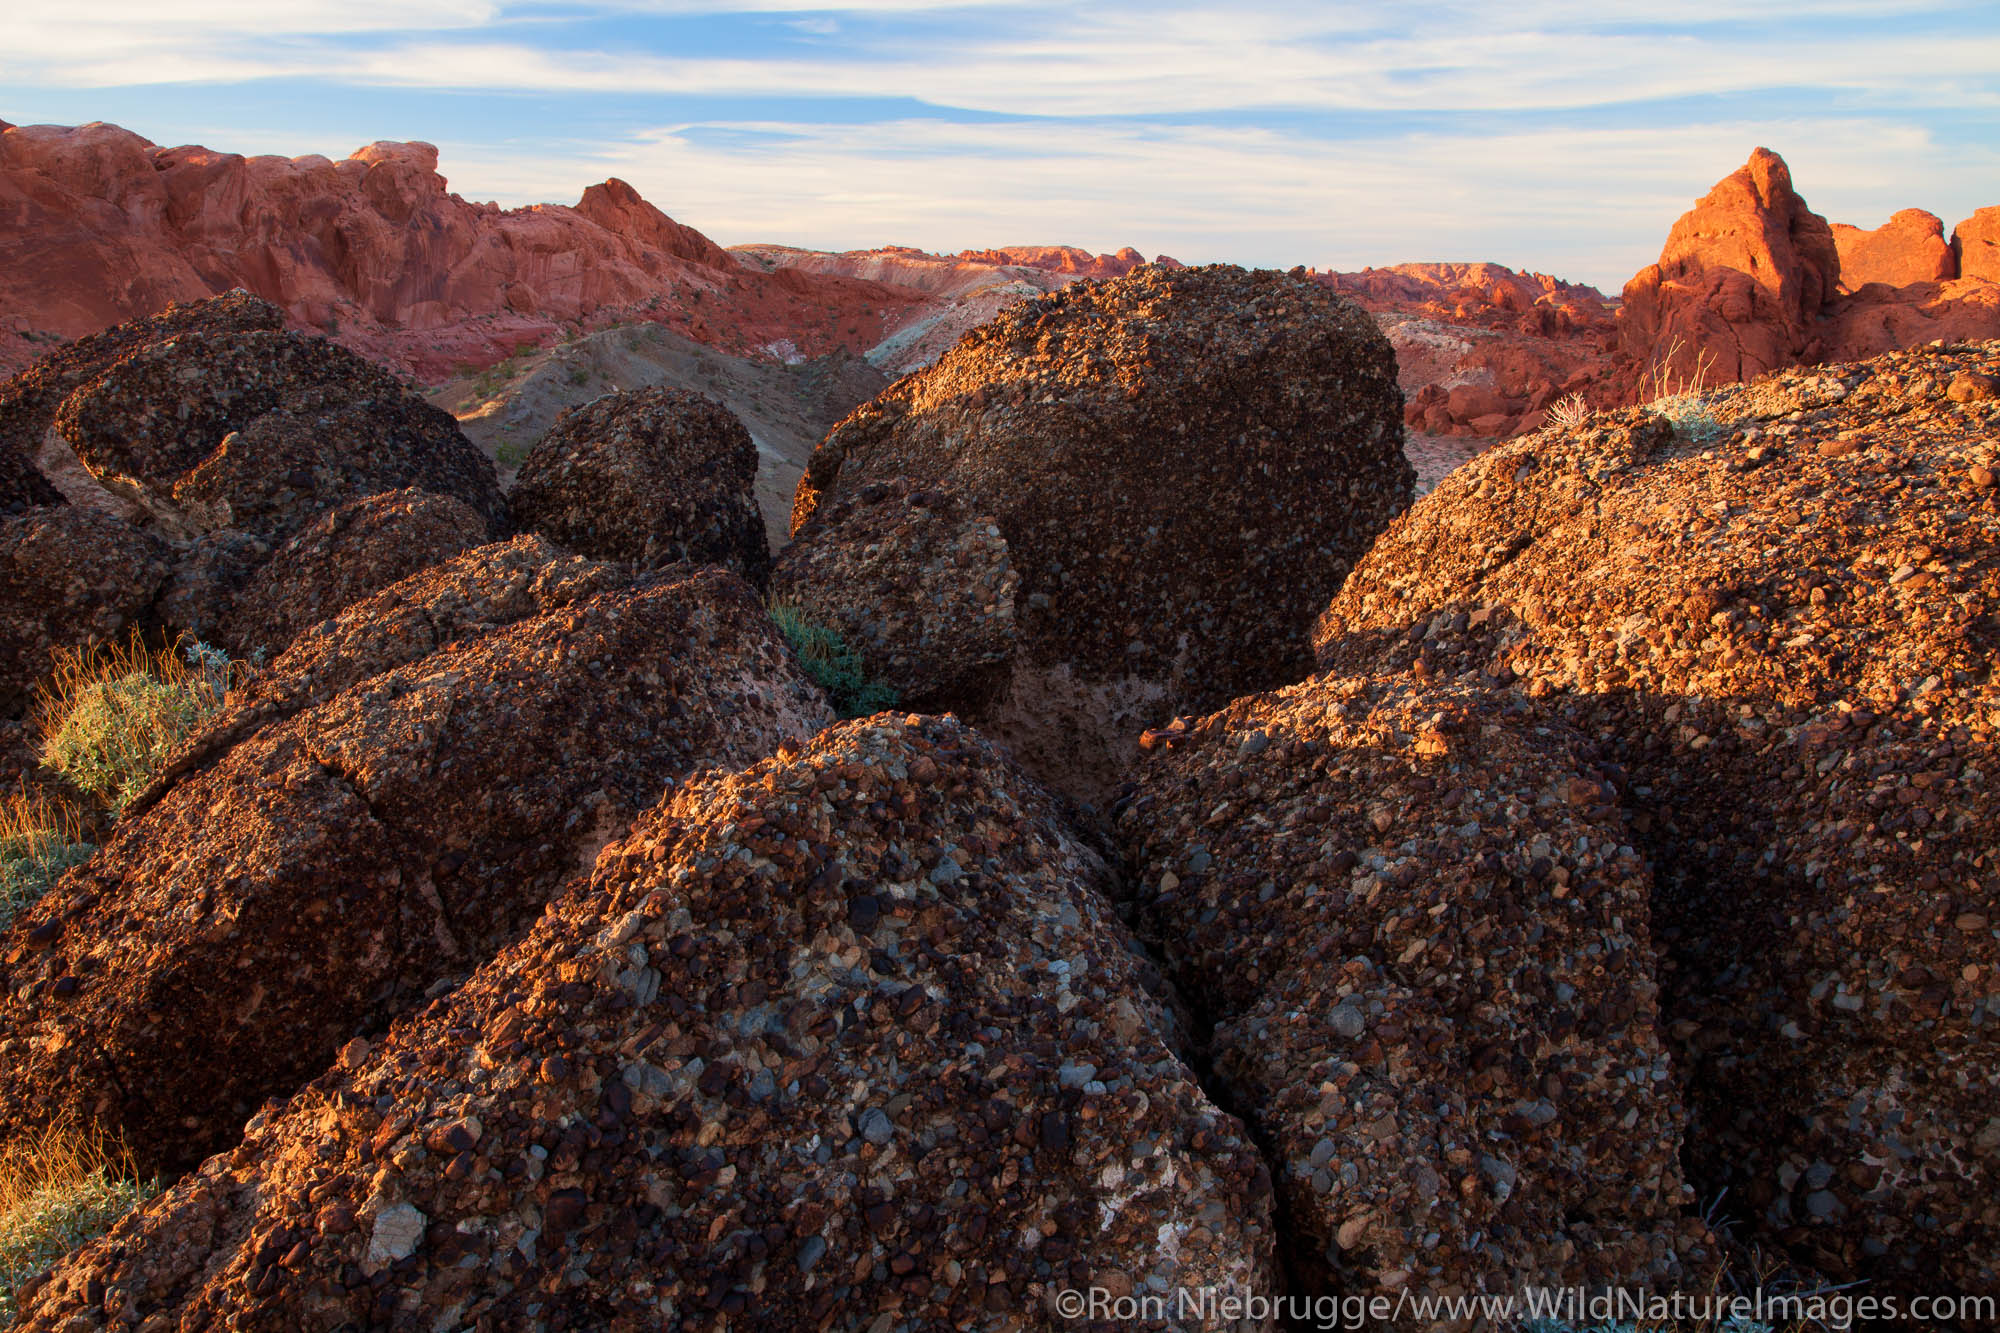 Valley of Fire State Park, Mojave Desert, Nevada